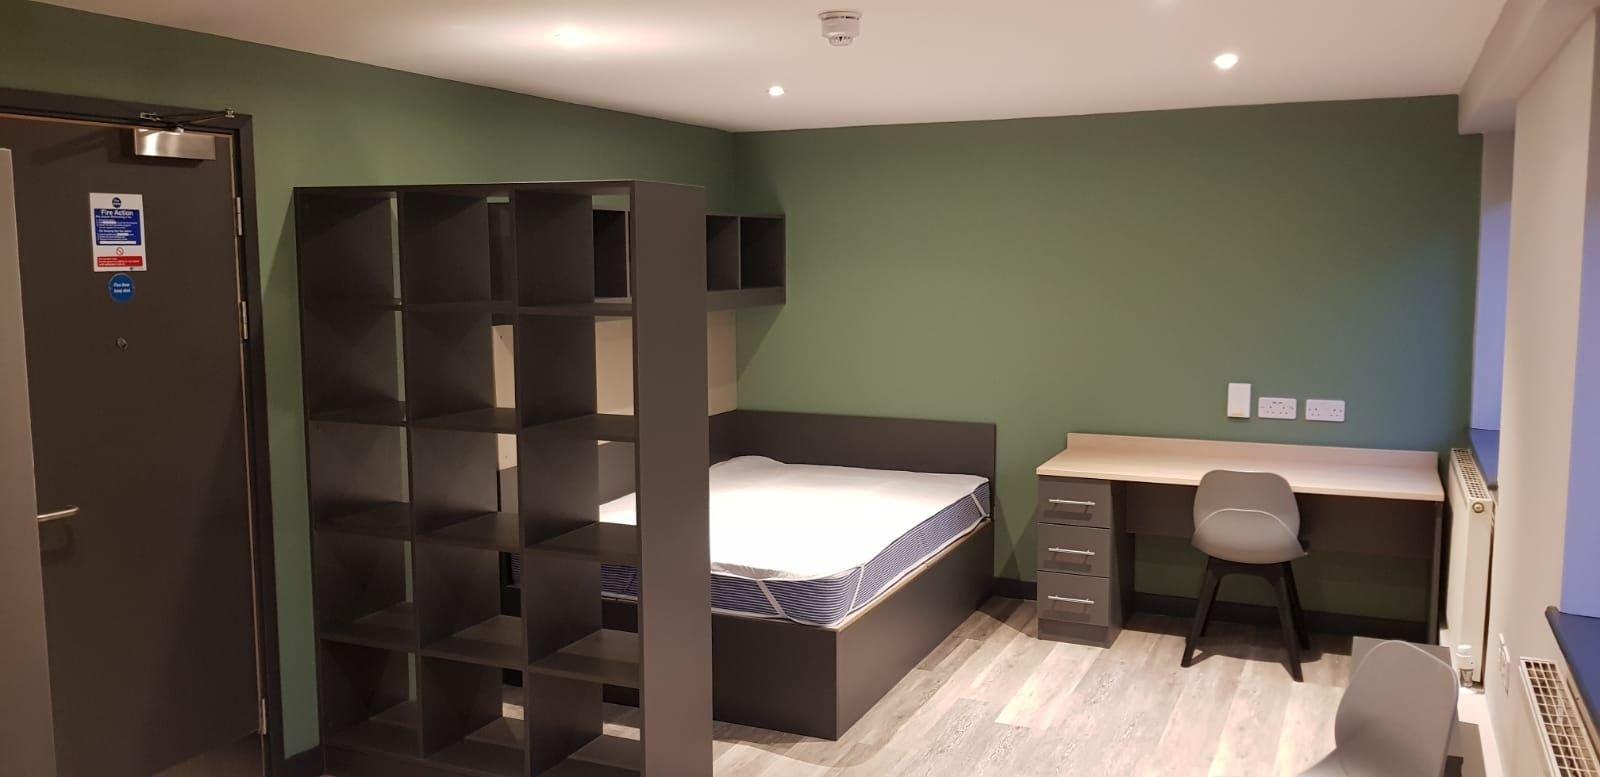 university student accommodation